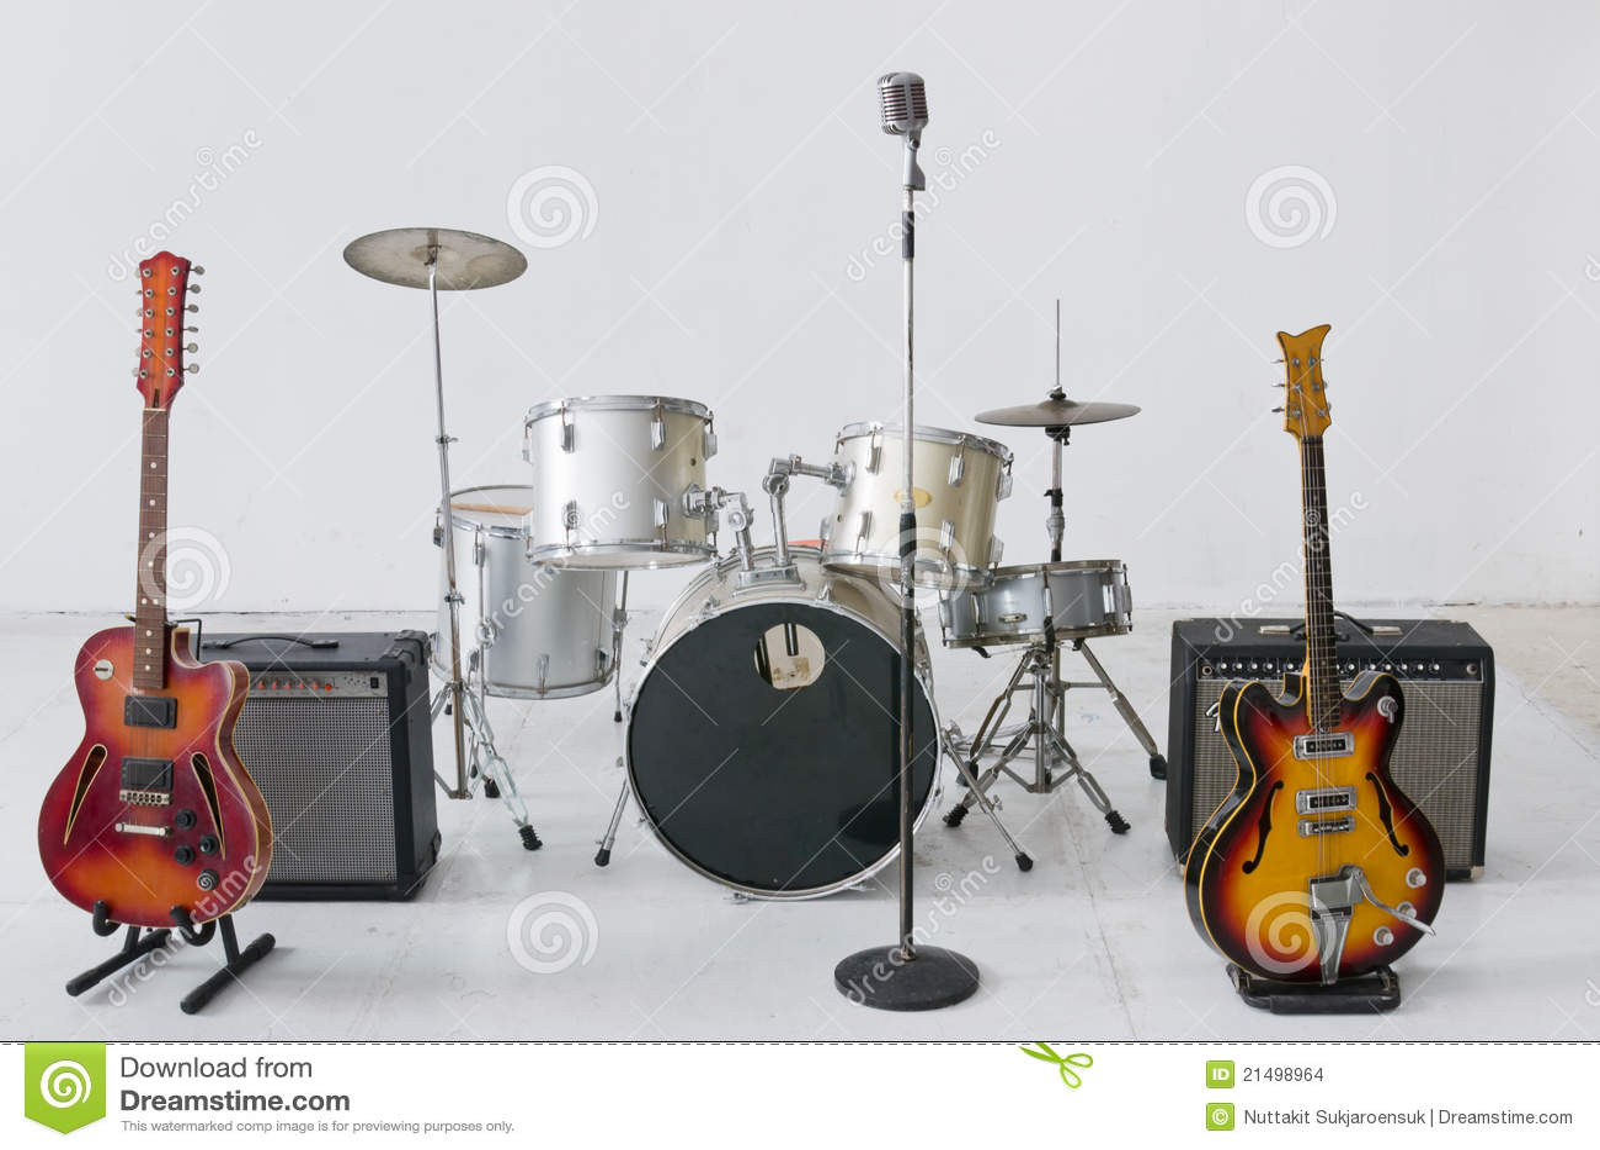 grupo musical lluvia: